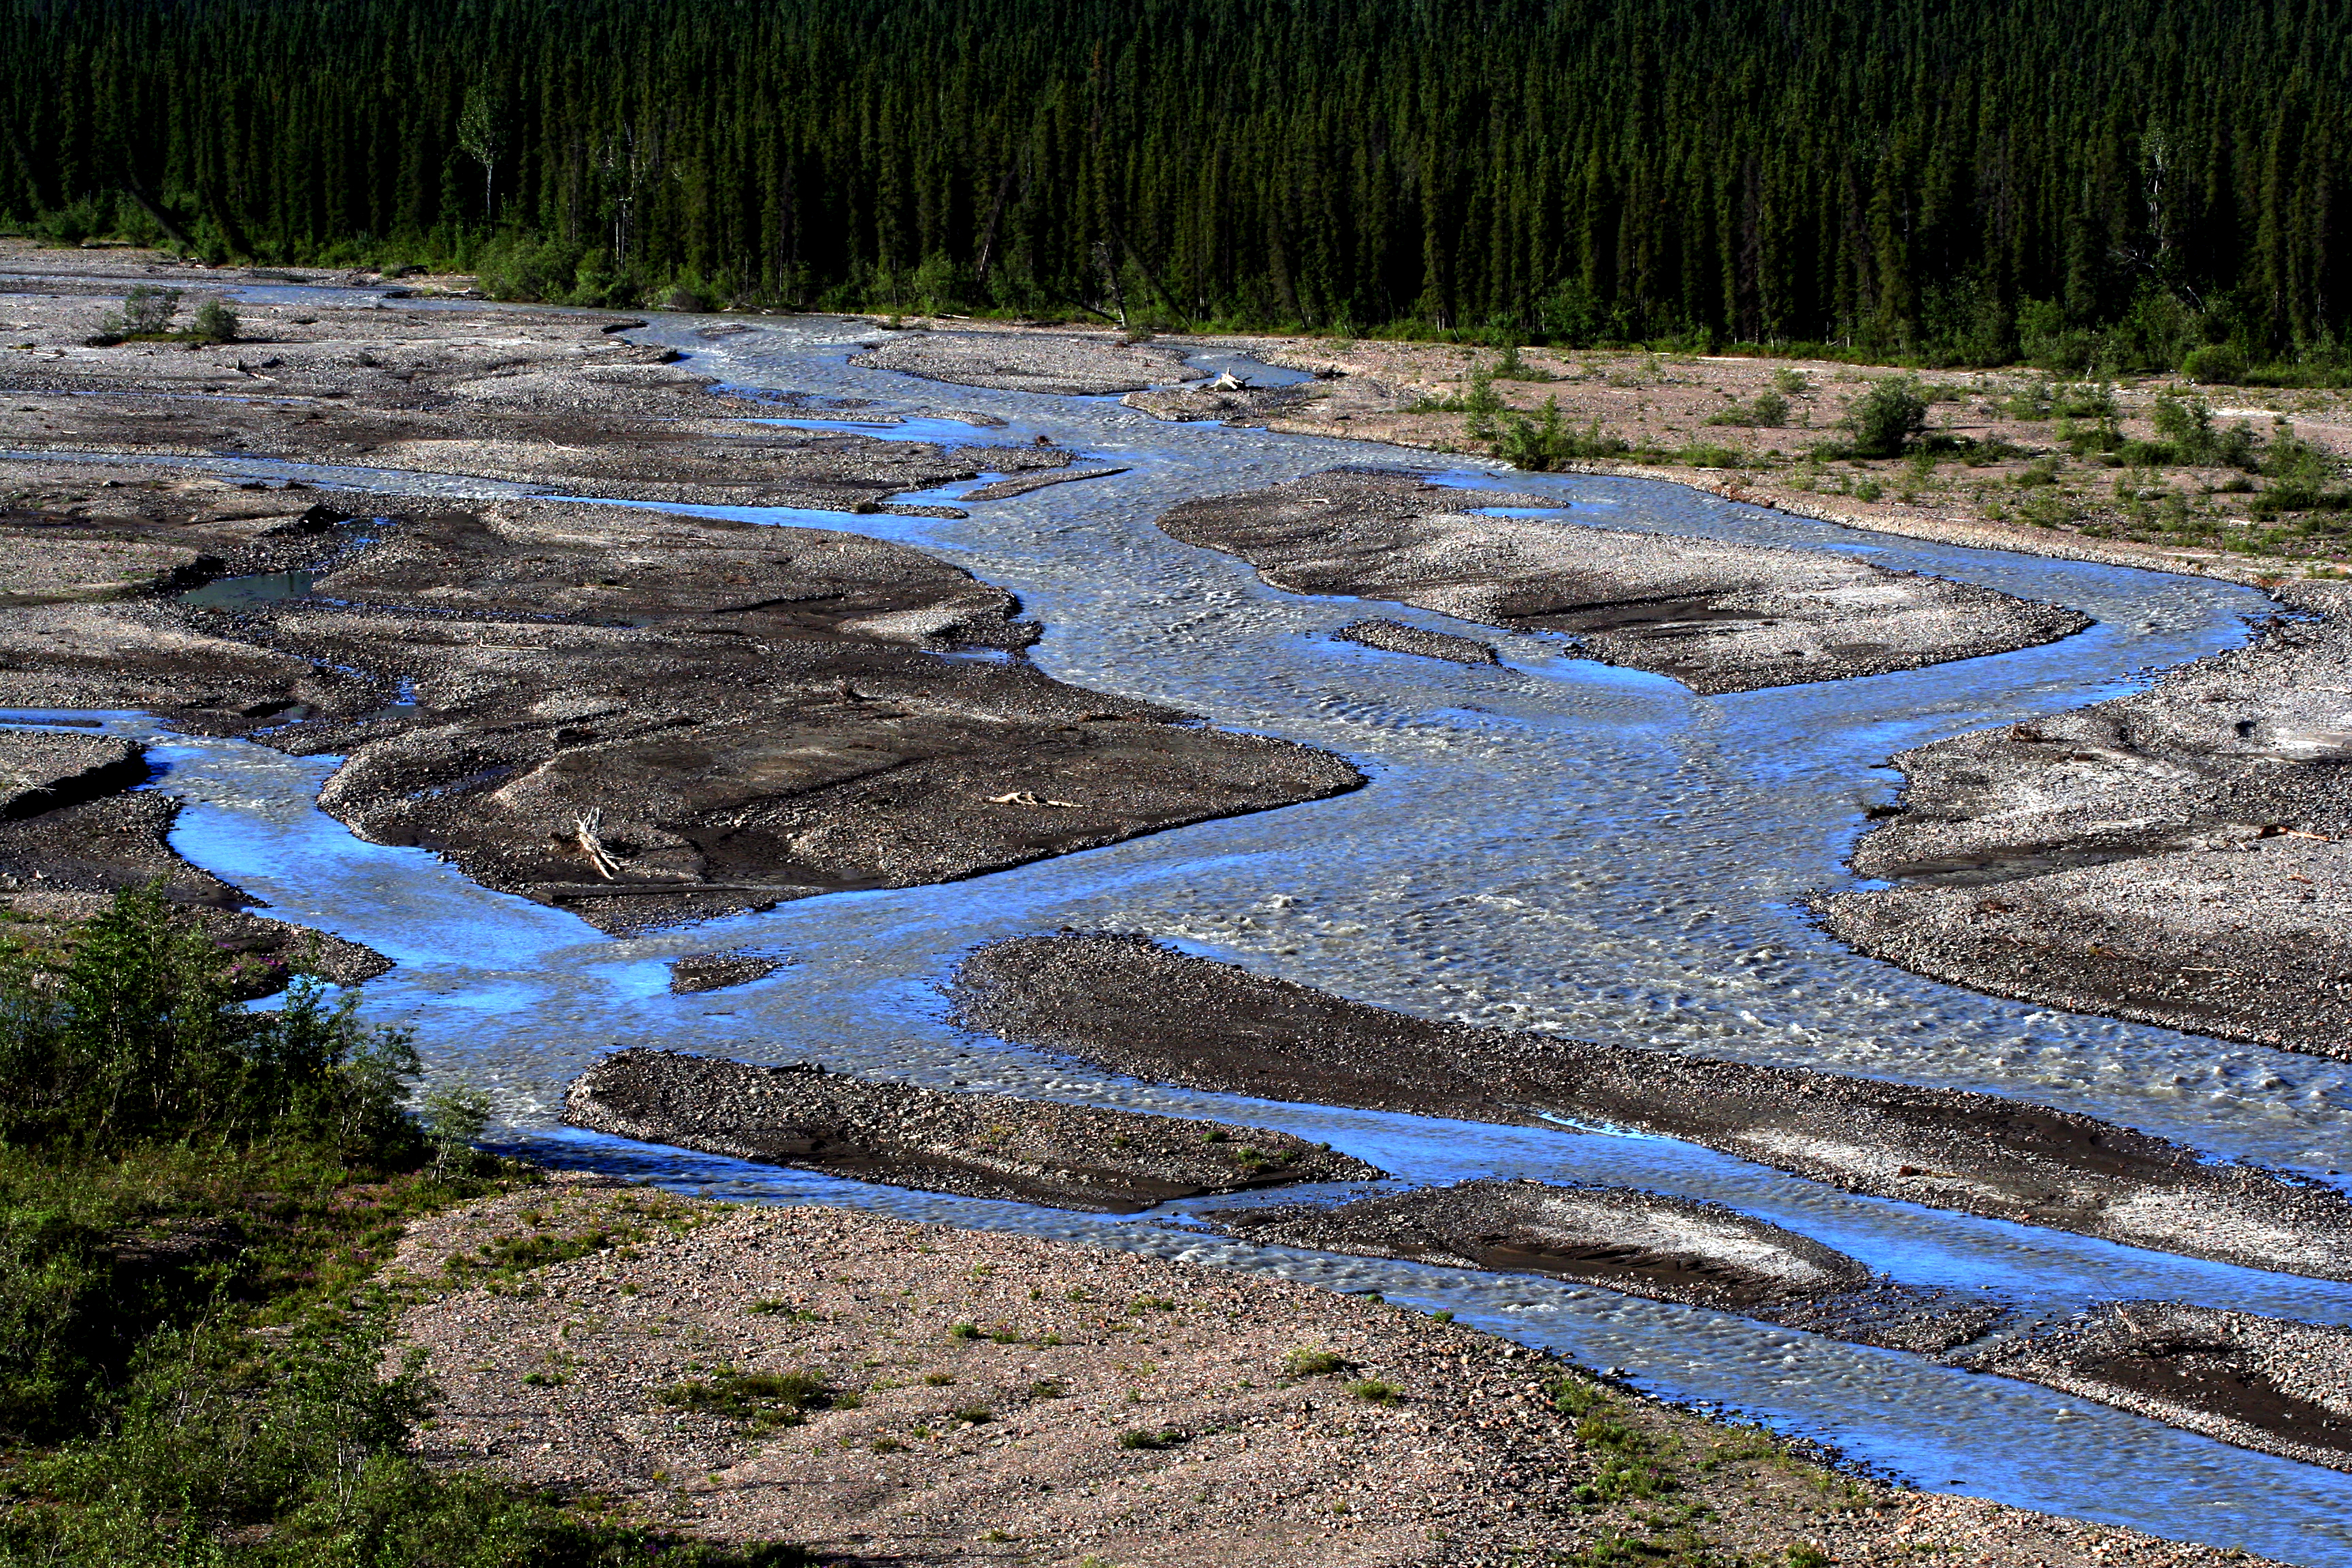 File:Braided river, Denali NP.jpg - Wikimedia Commons